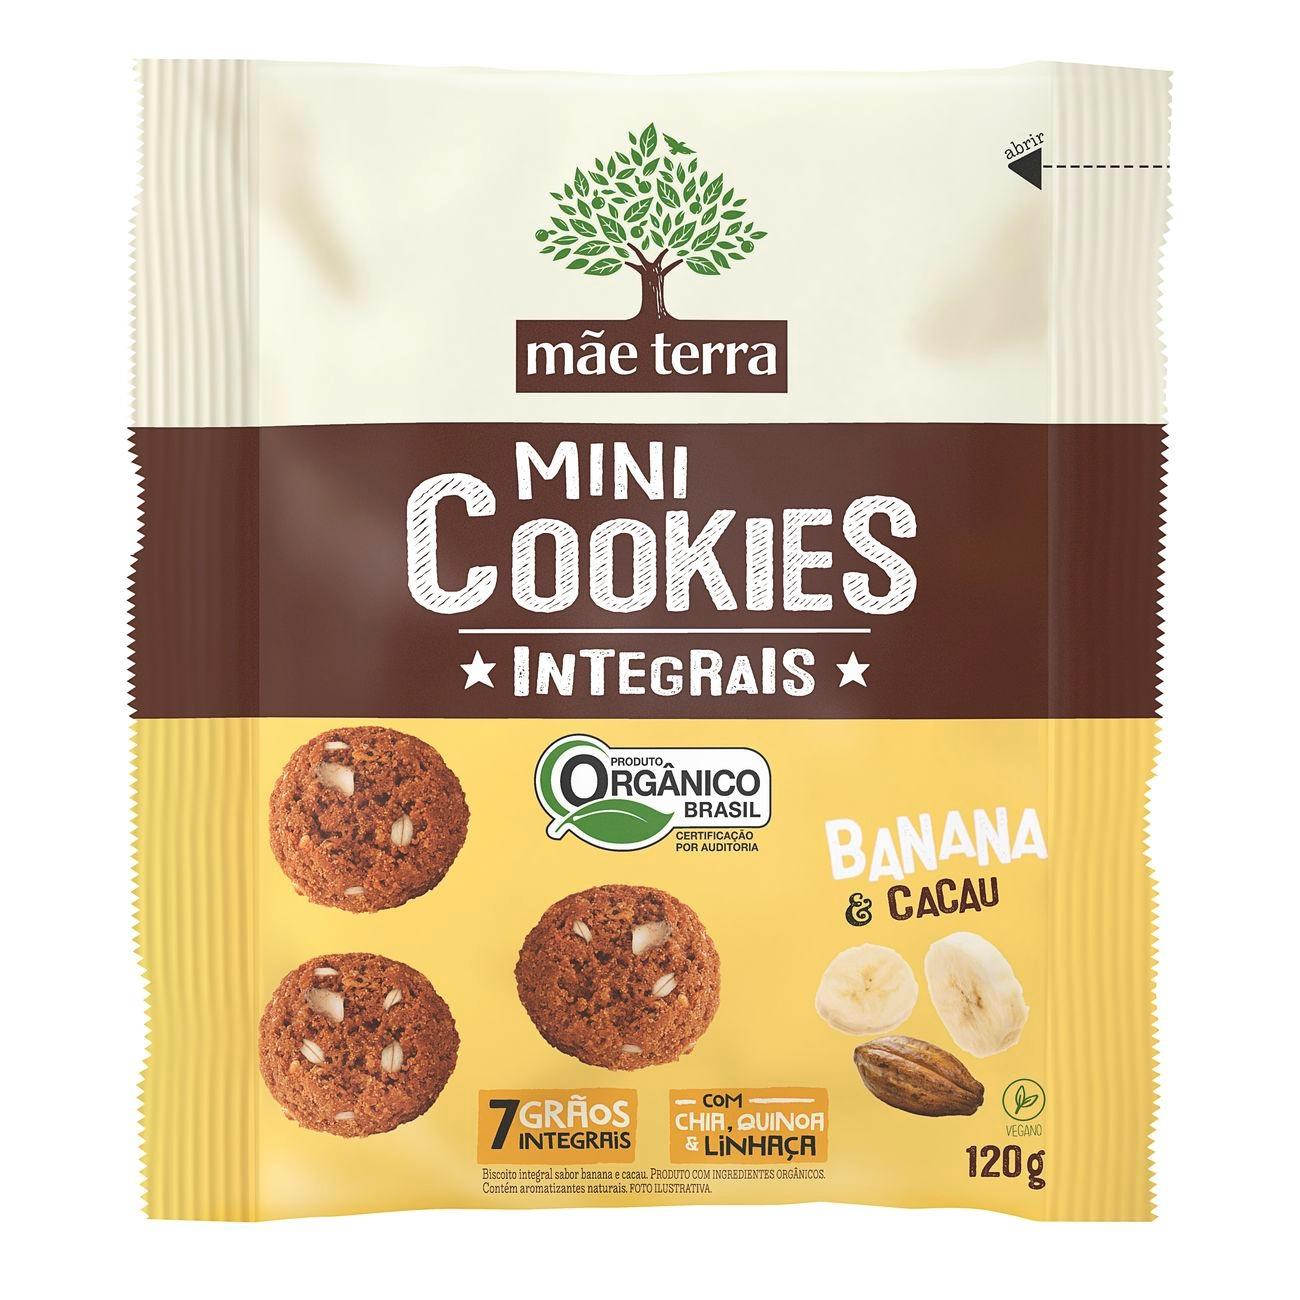 Cookie Integral Orgânico Banana e Cacau 120g